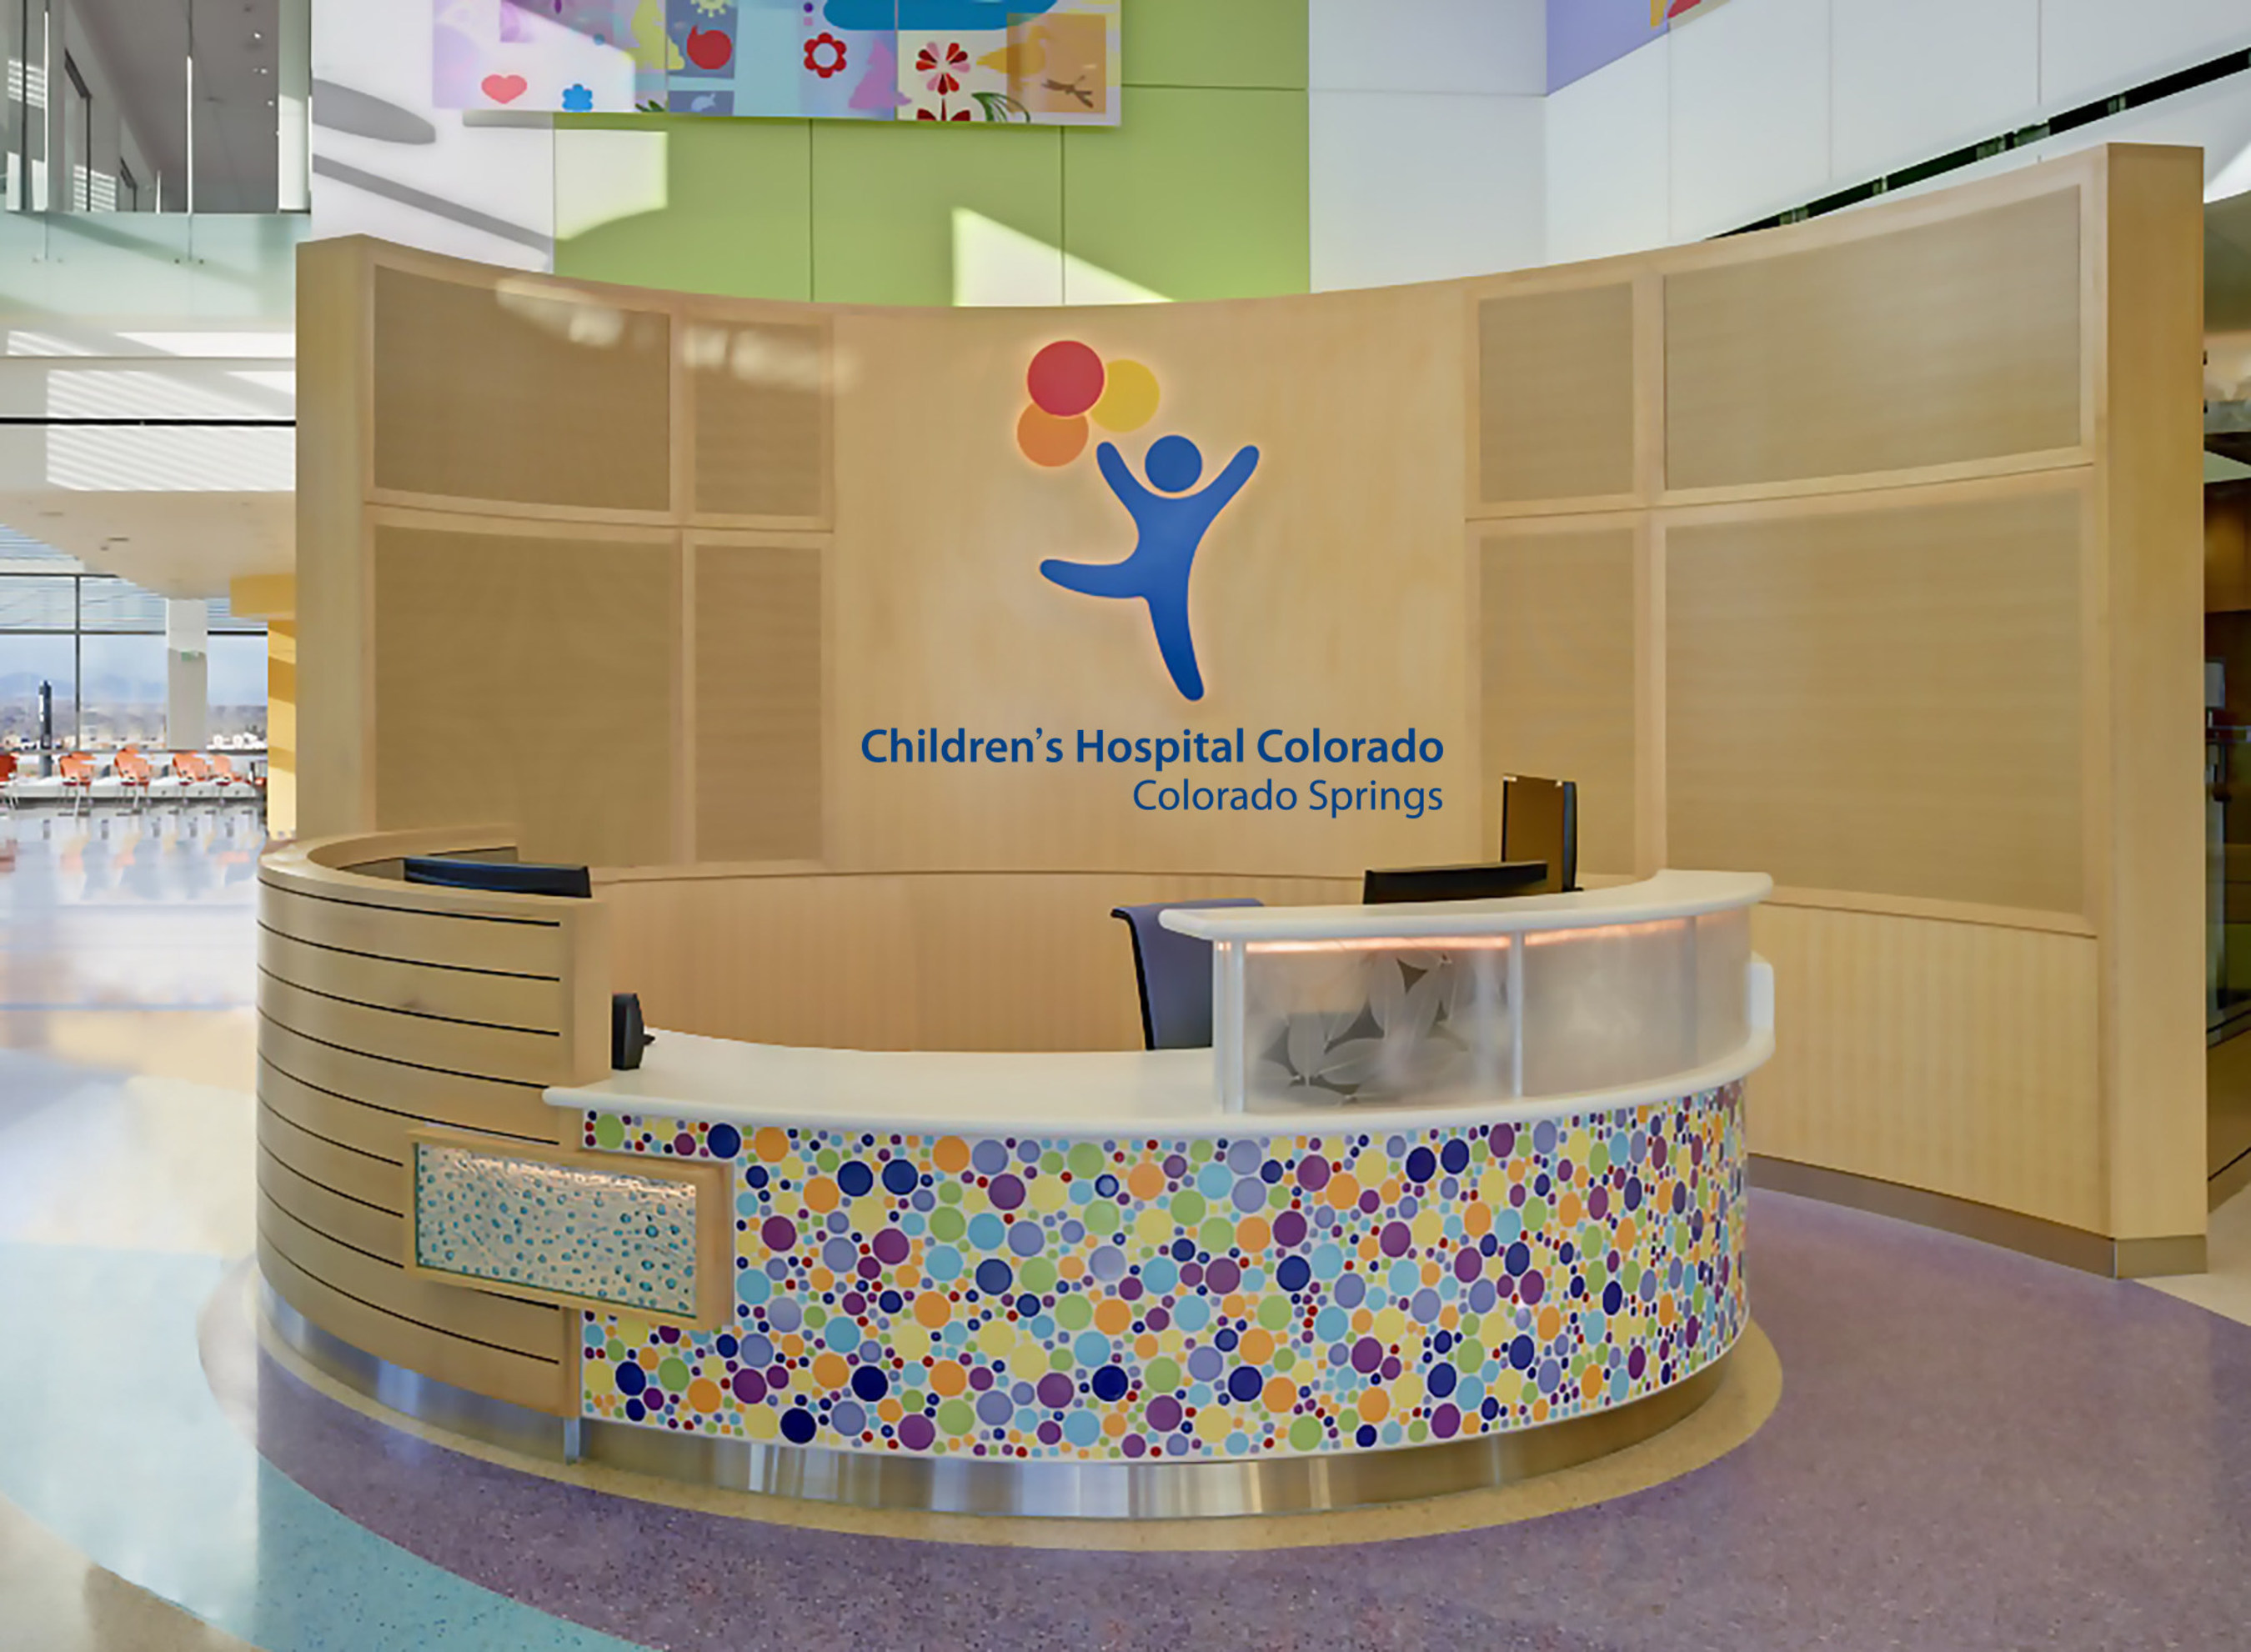 Children's Hospital Colorado Announces Plans to Open New